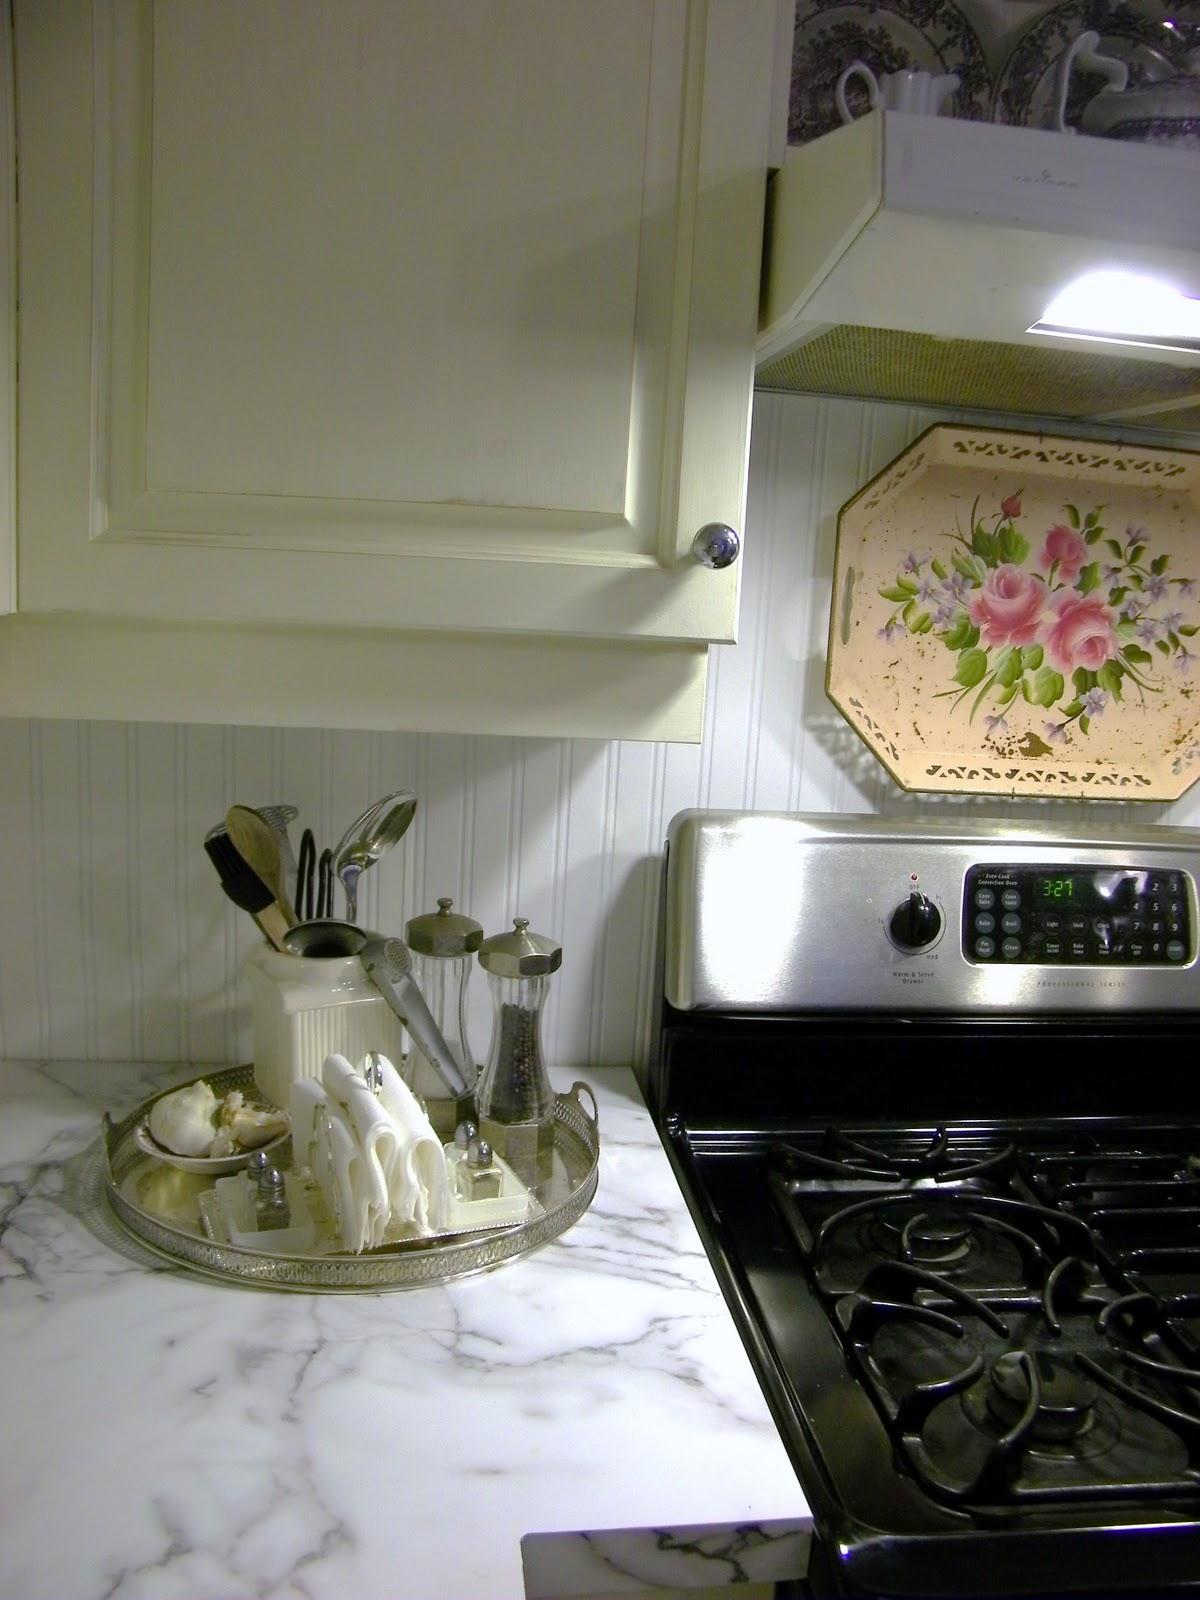 Maison Decor: Kitchen Is Done